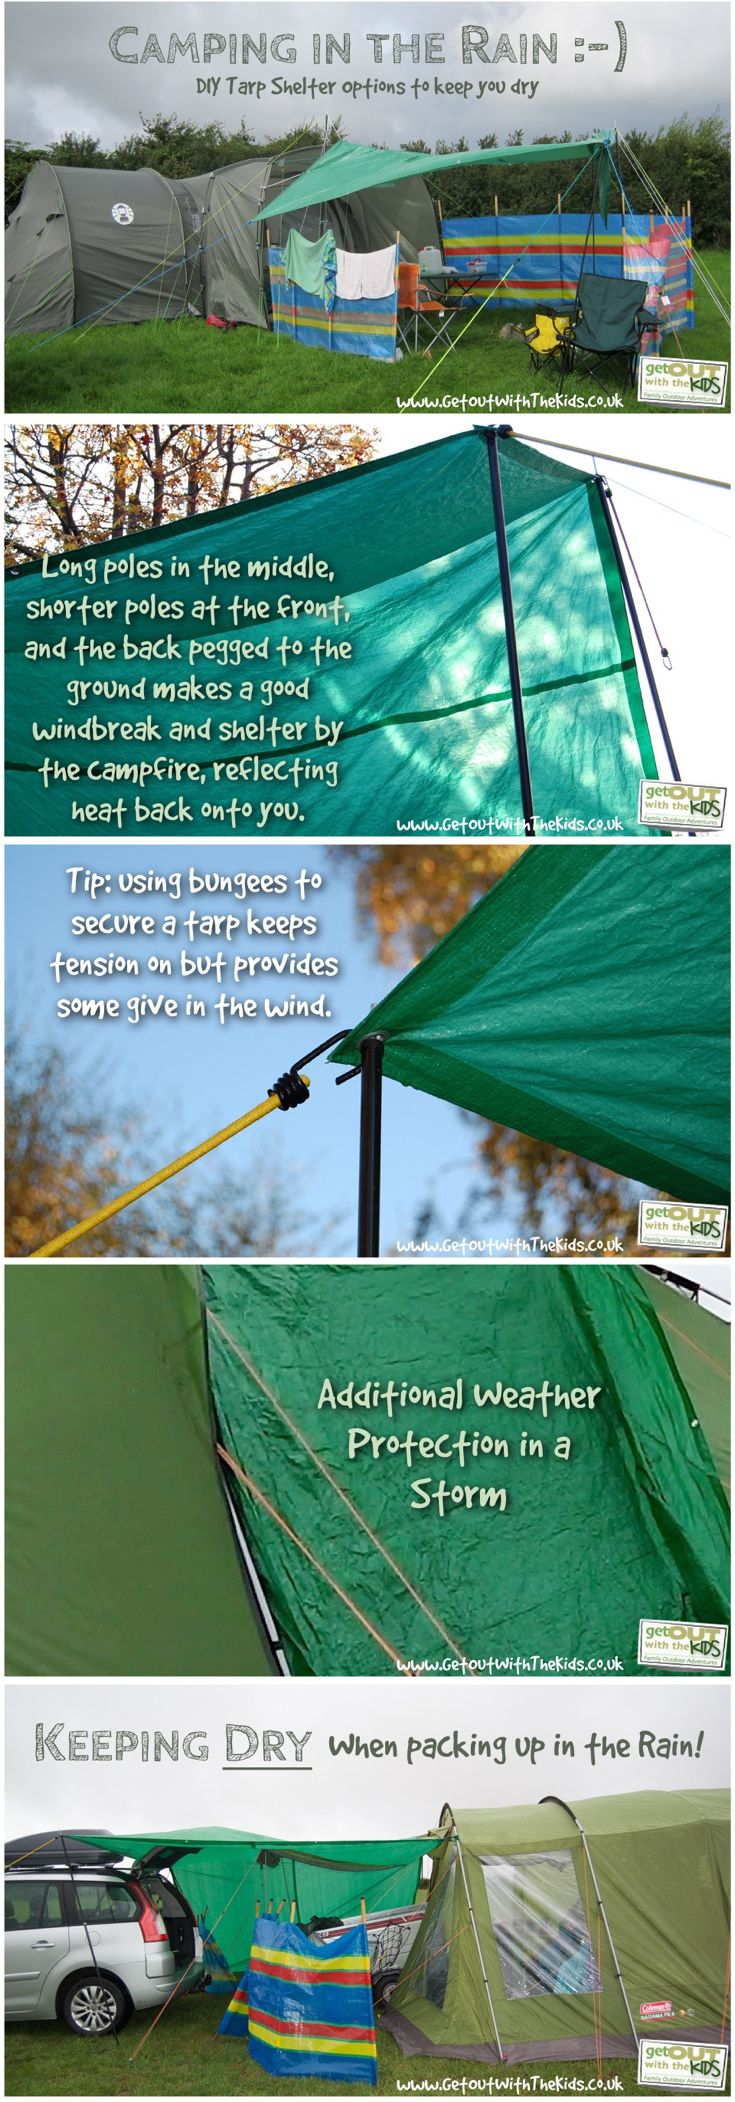 diy camping tarp tips pin   camping life   pinterest   camping, tent